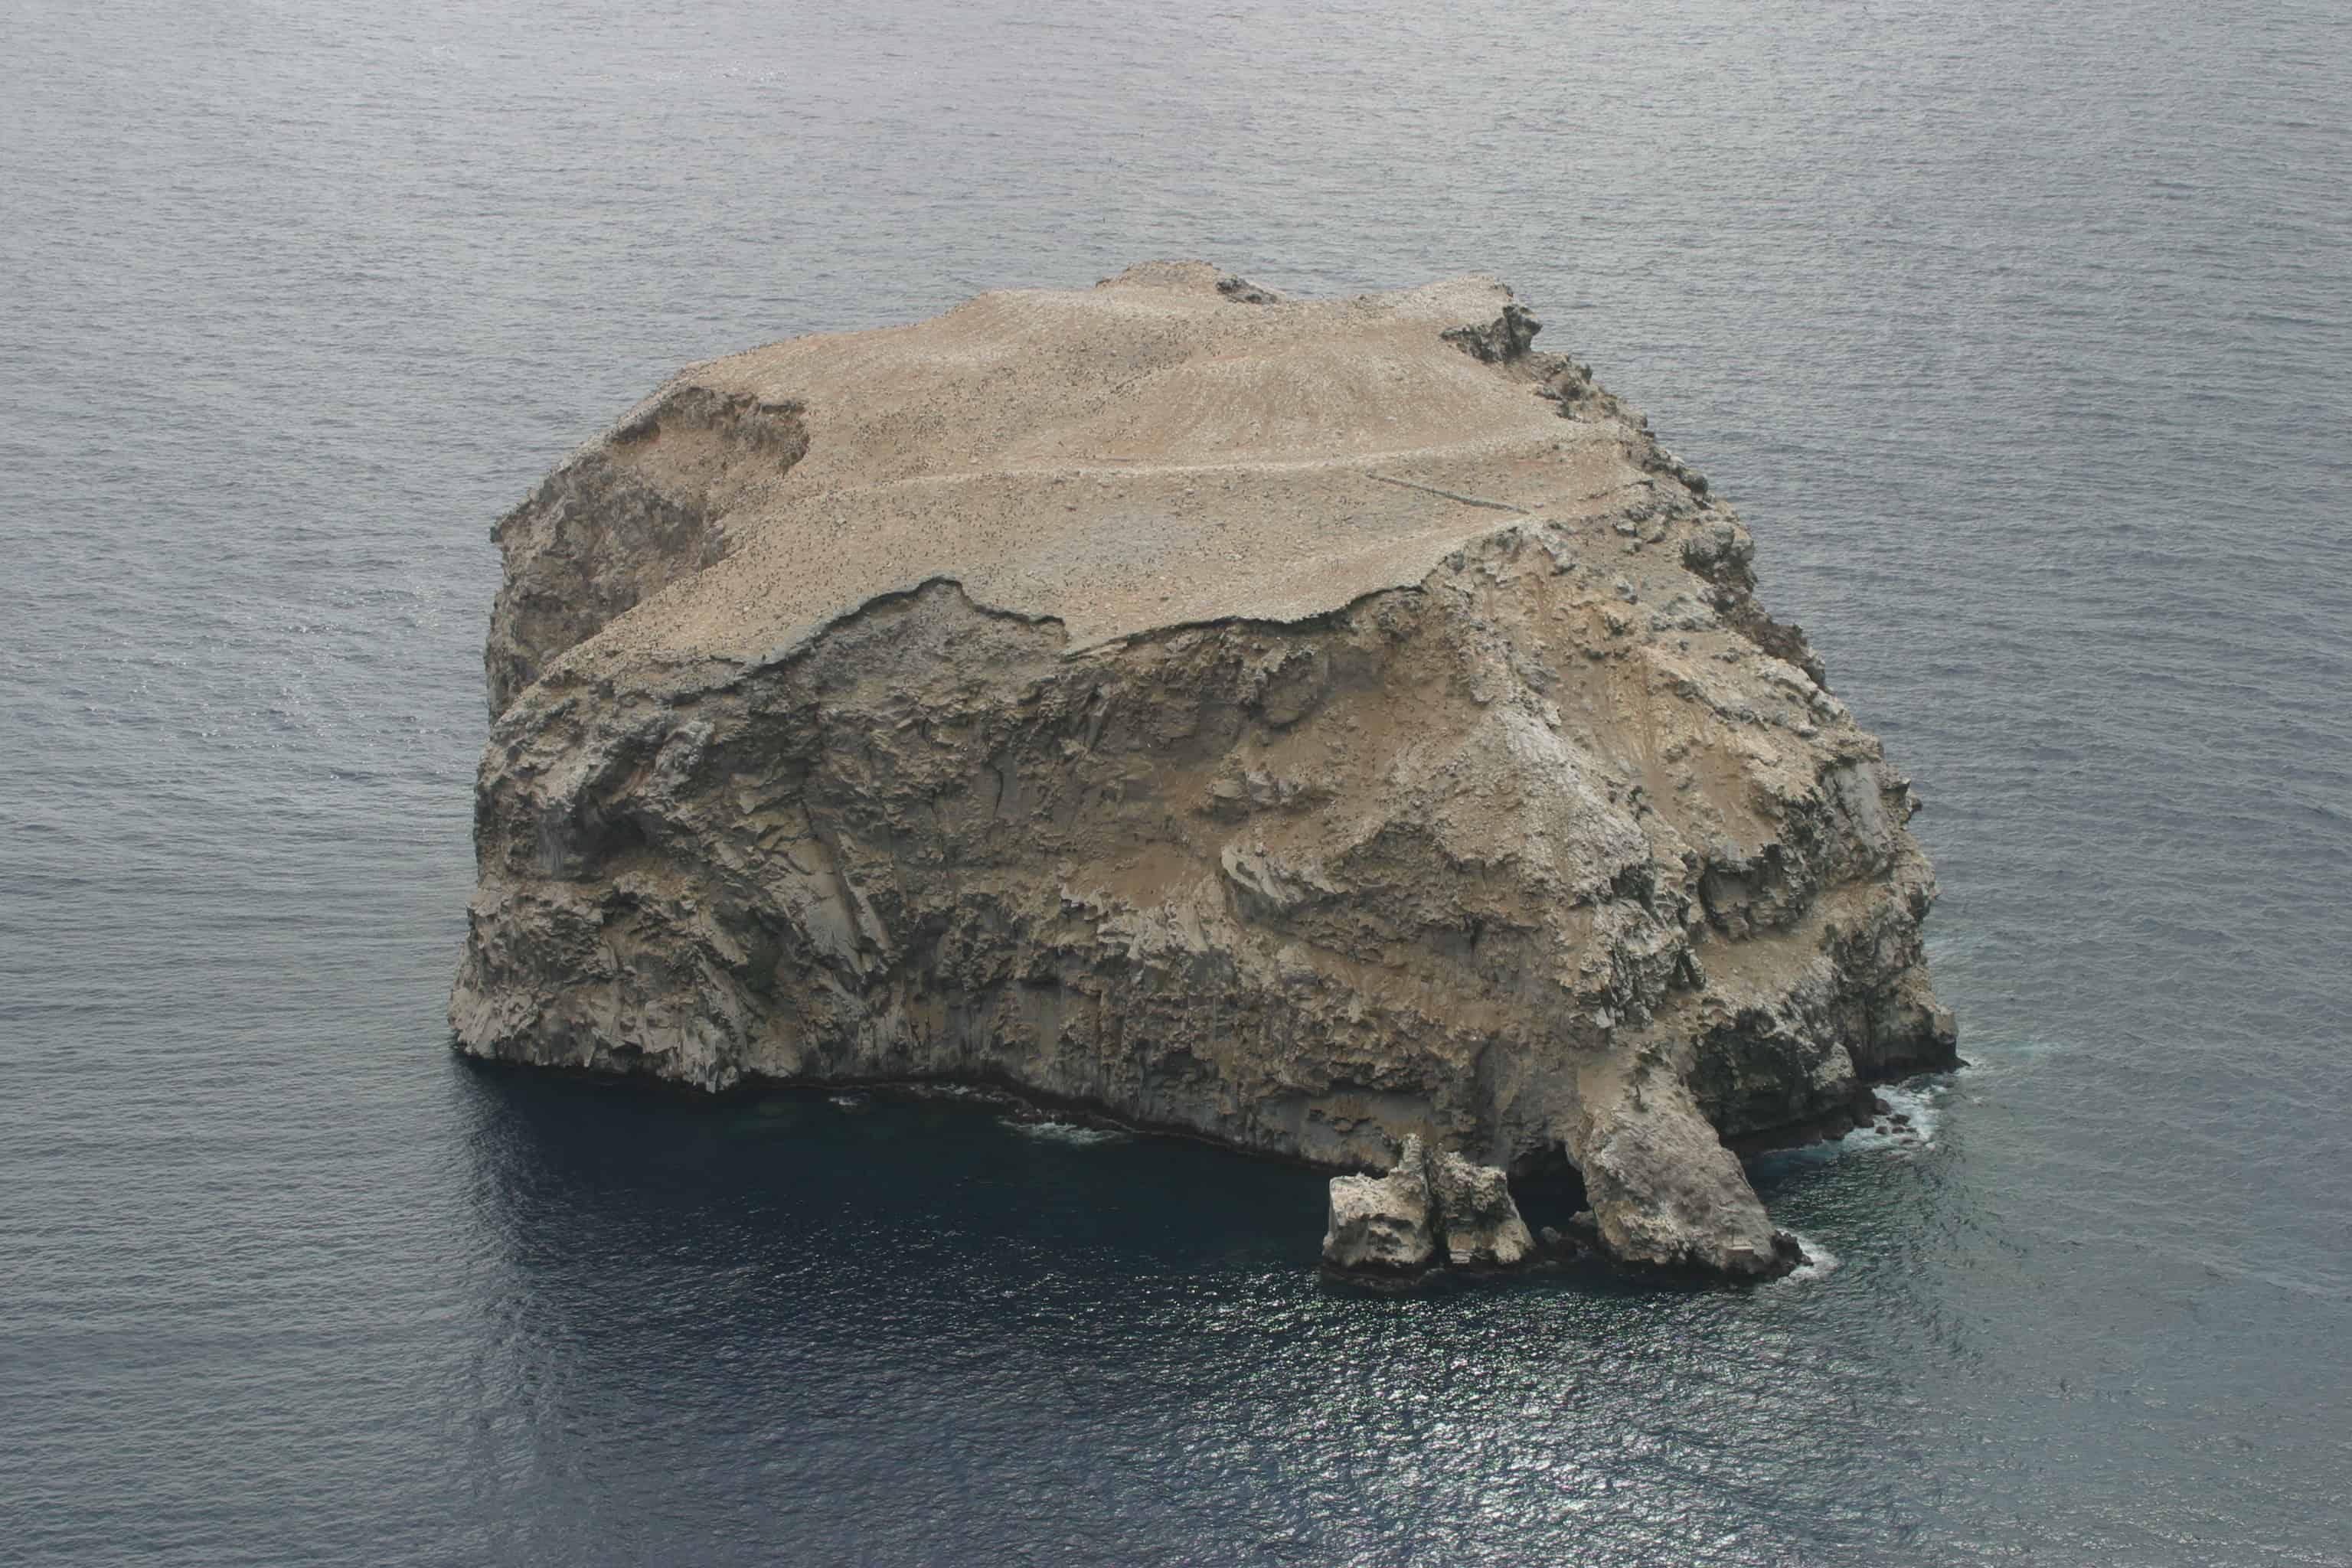 Boatswain Bird Island from the mainland opposite. Copyright: Dr Mike Pienkowski